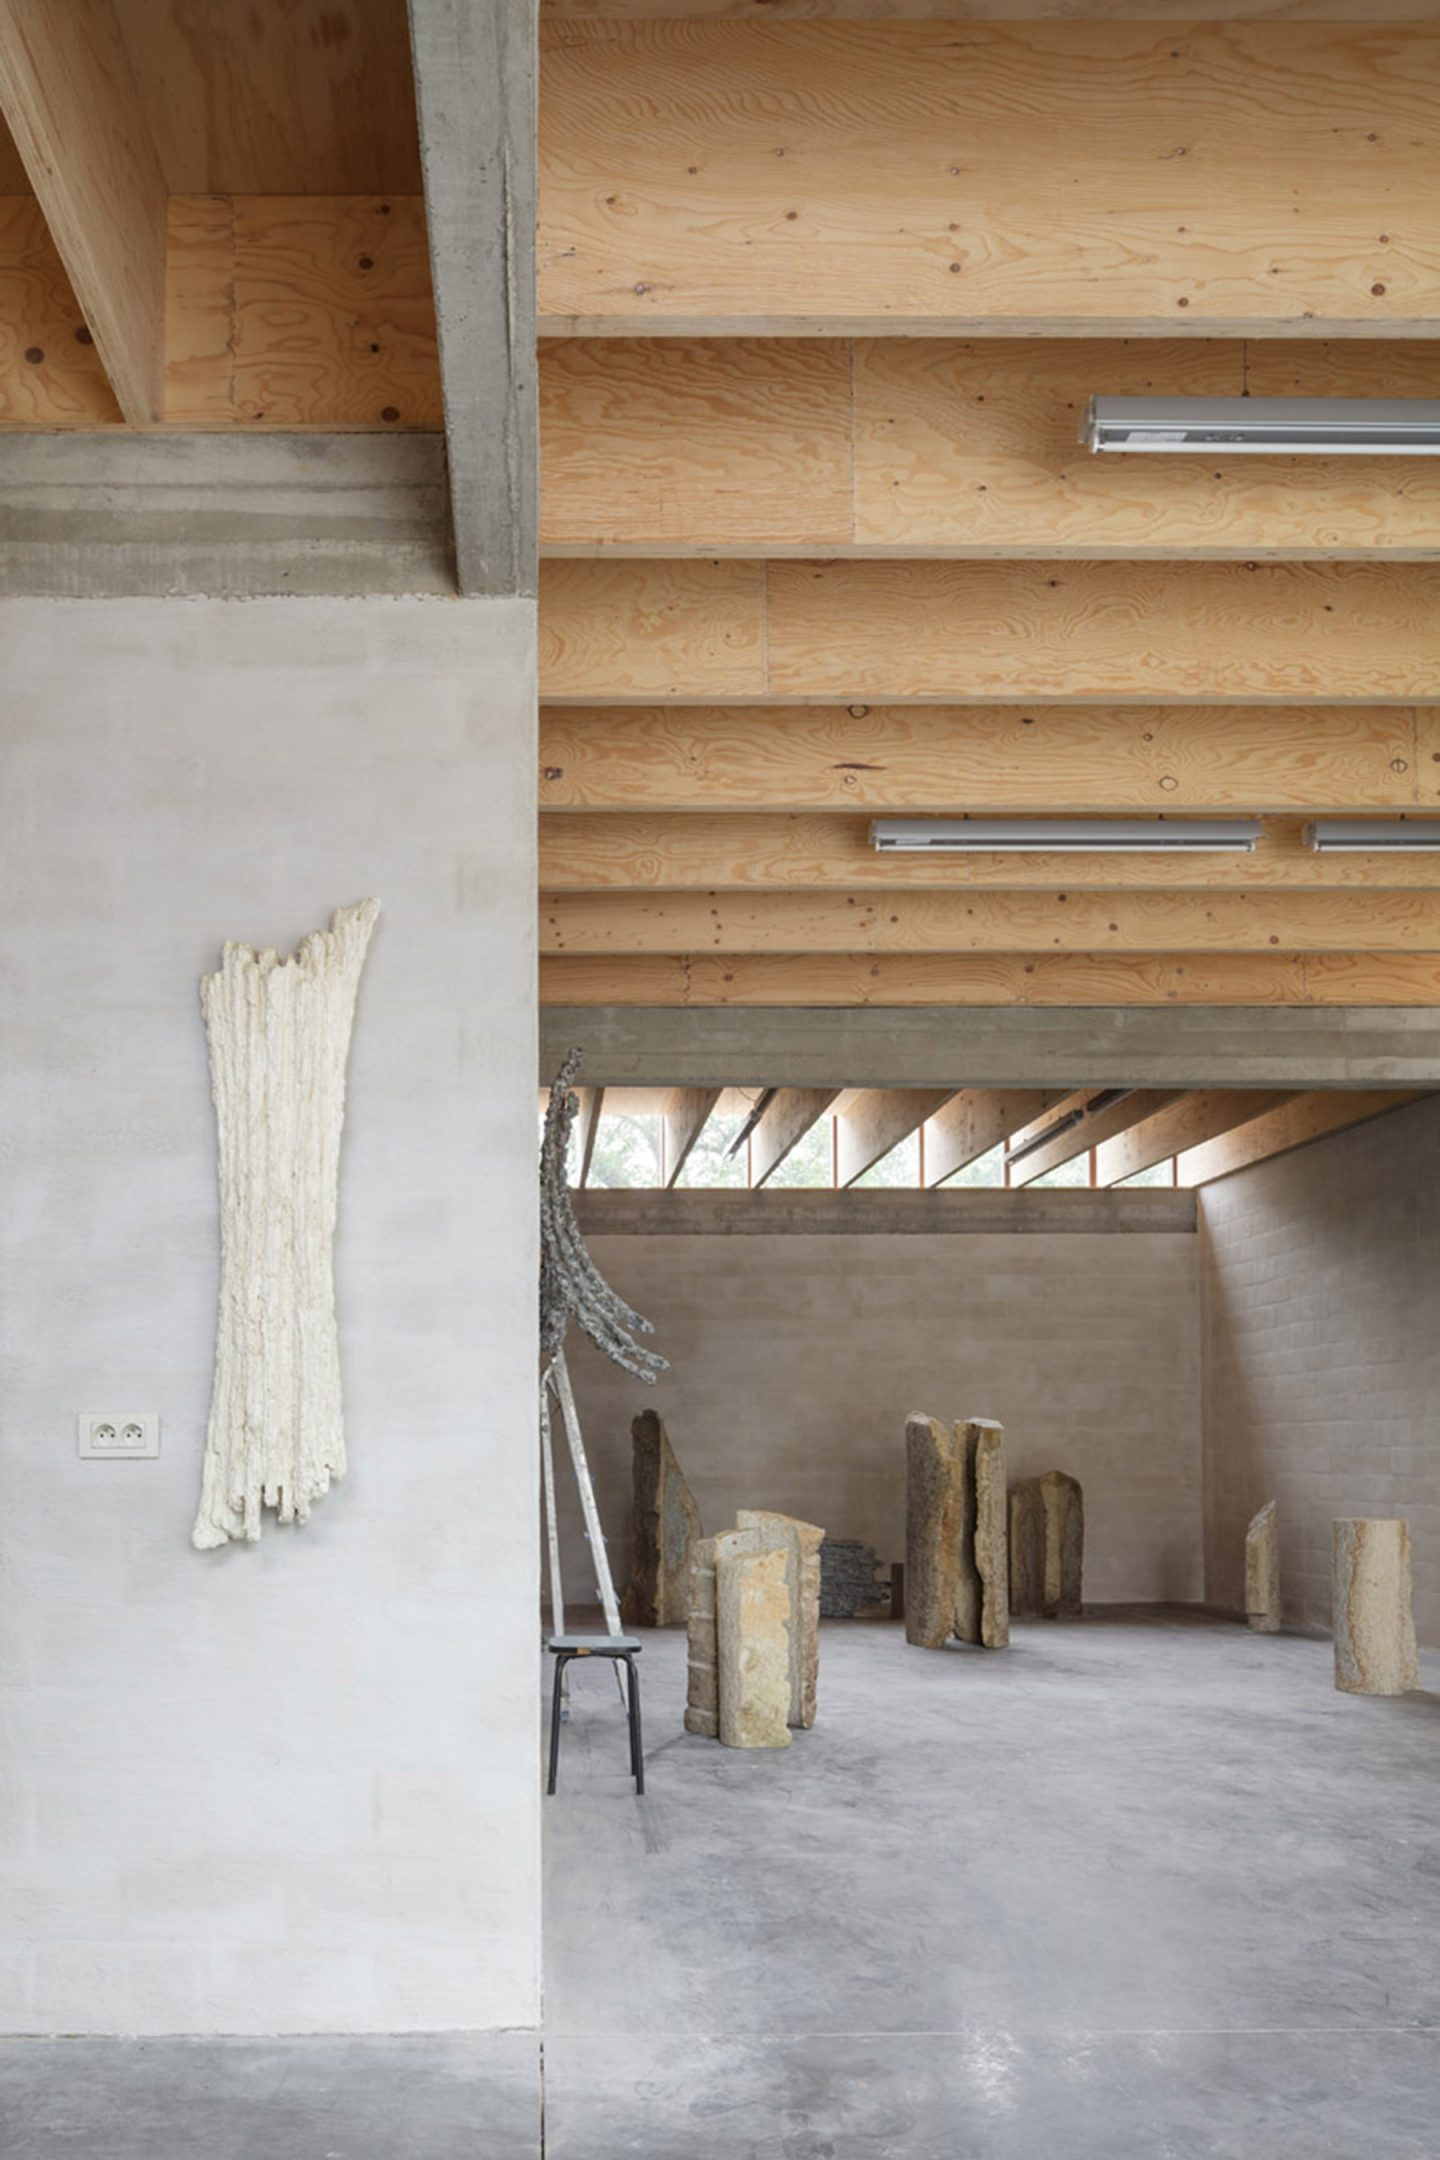 iGNANT-Architecture-Raamwerk-Van-Gelder-Tilleman-House-For-A-Sculptor-012